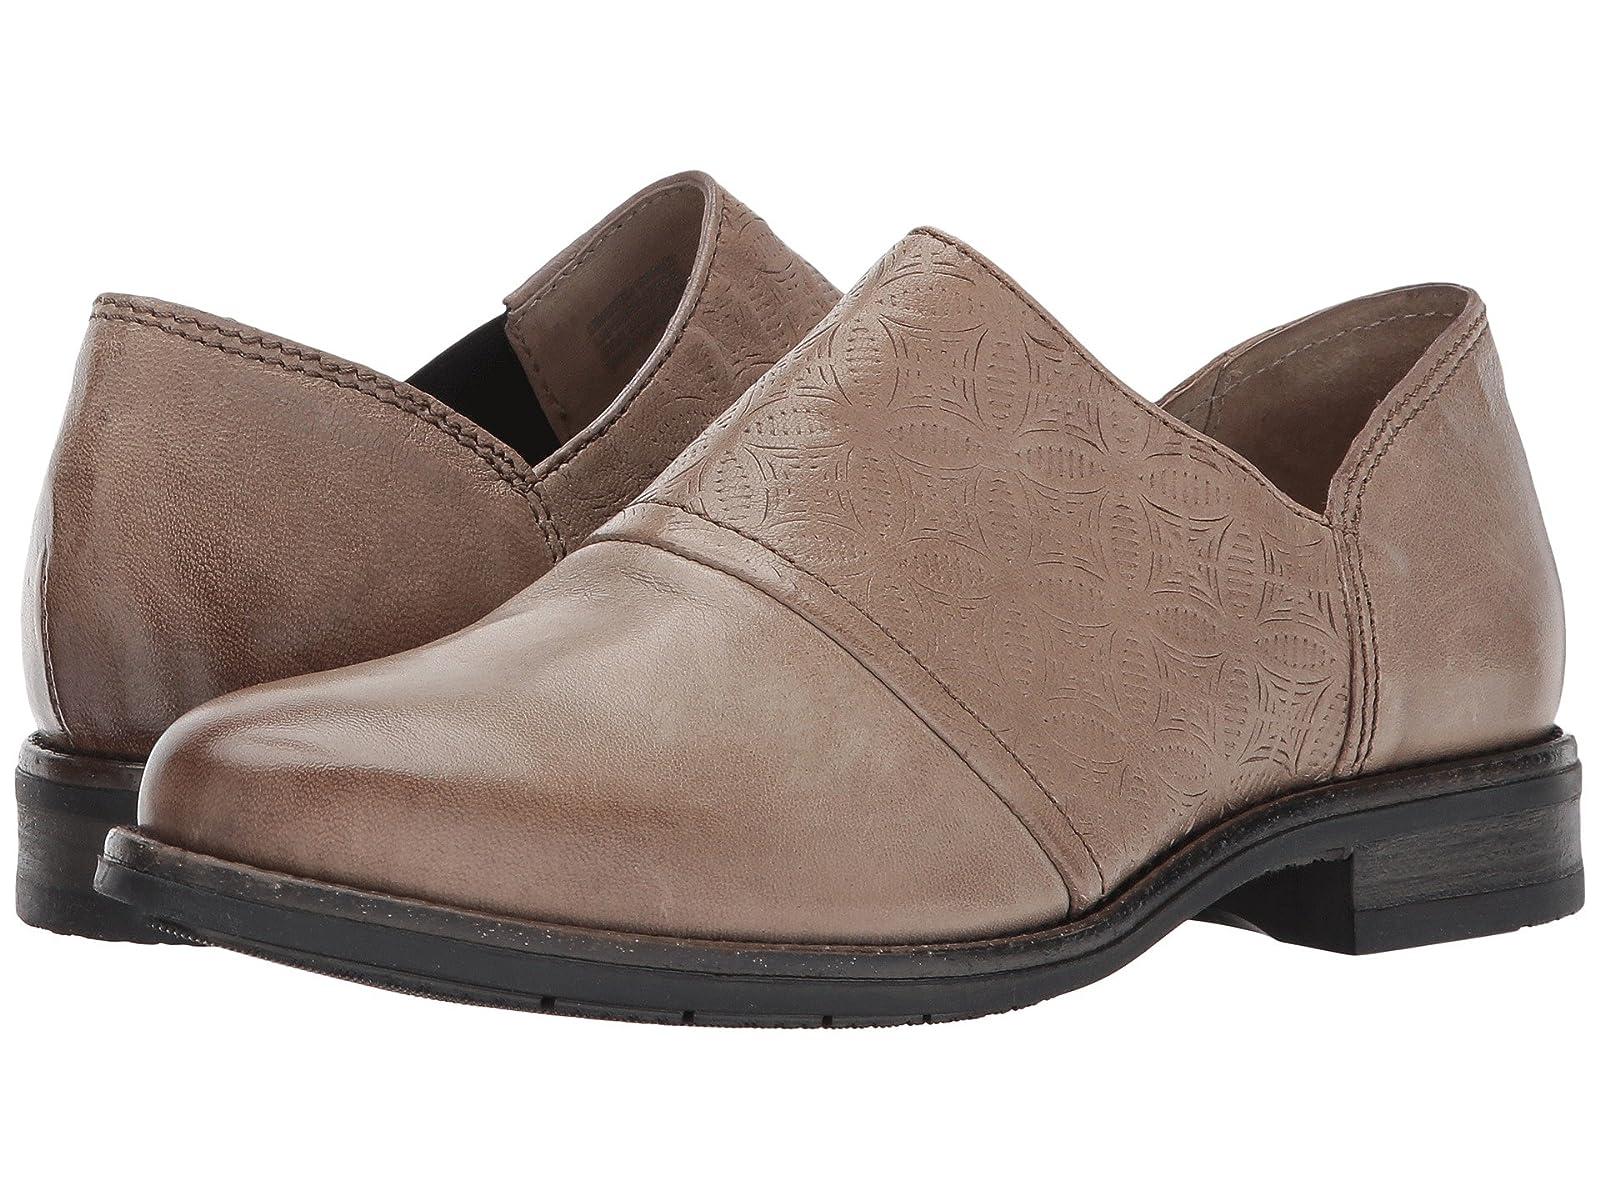 Miz Mooz TennesseeCheap and distinctive eye-catching shoes